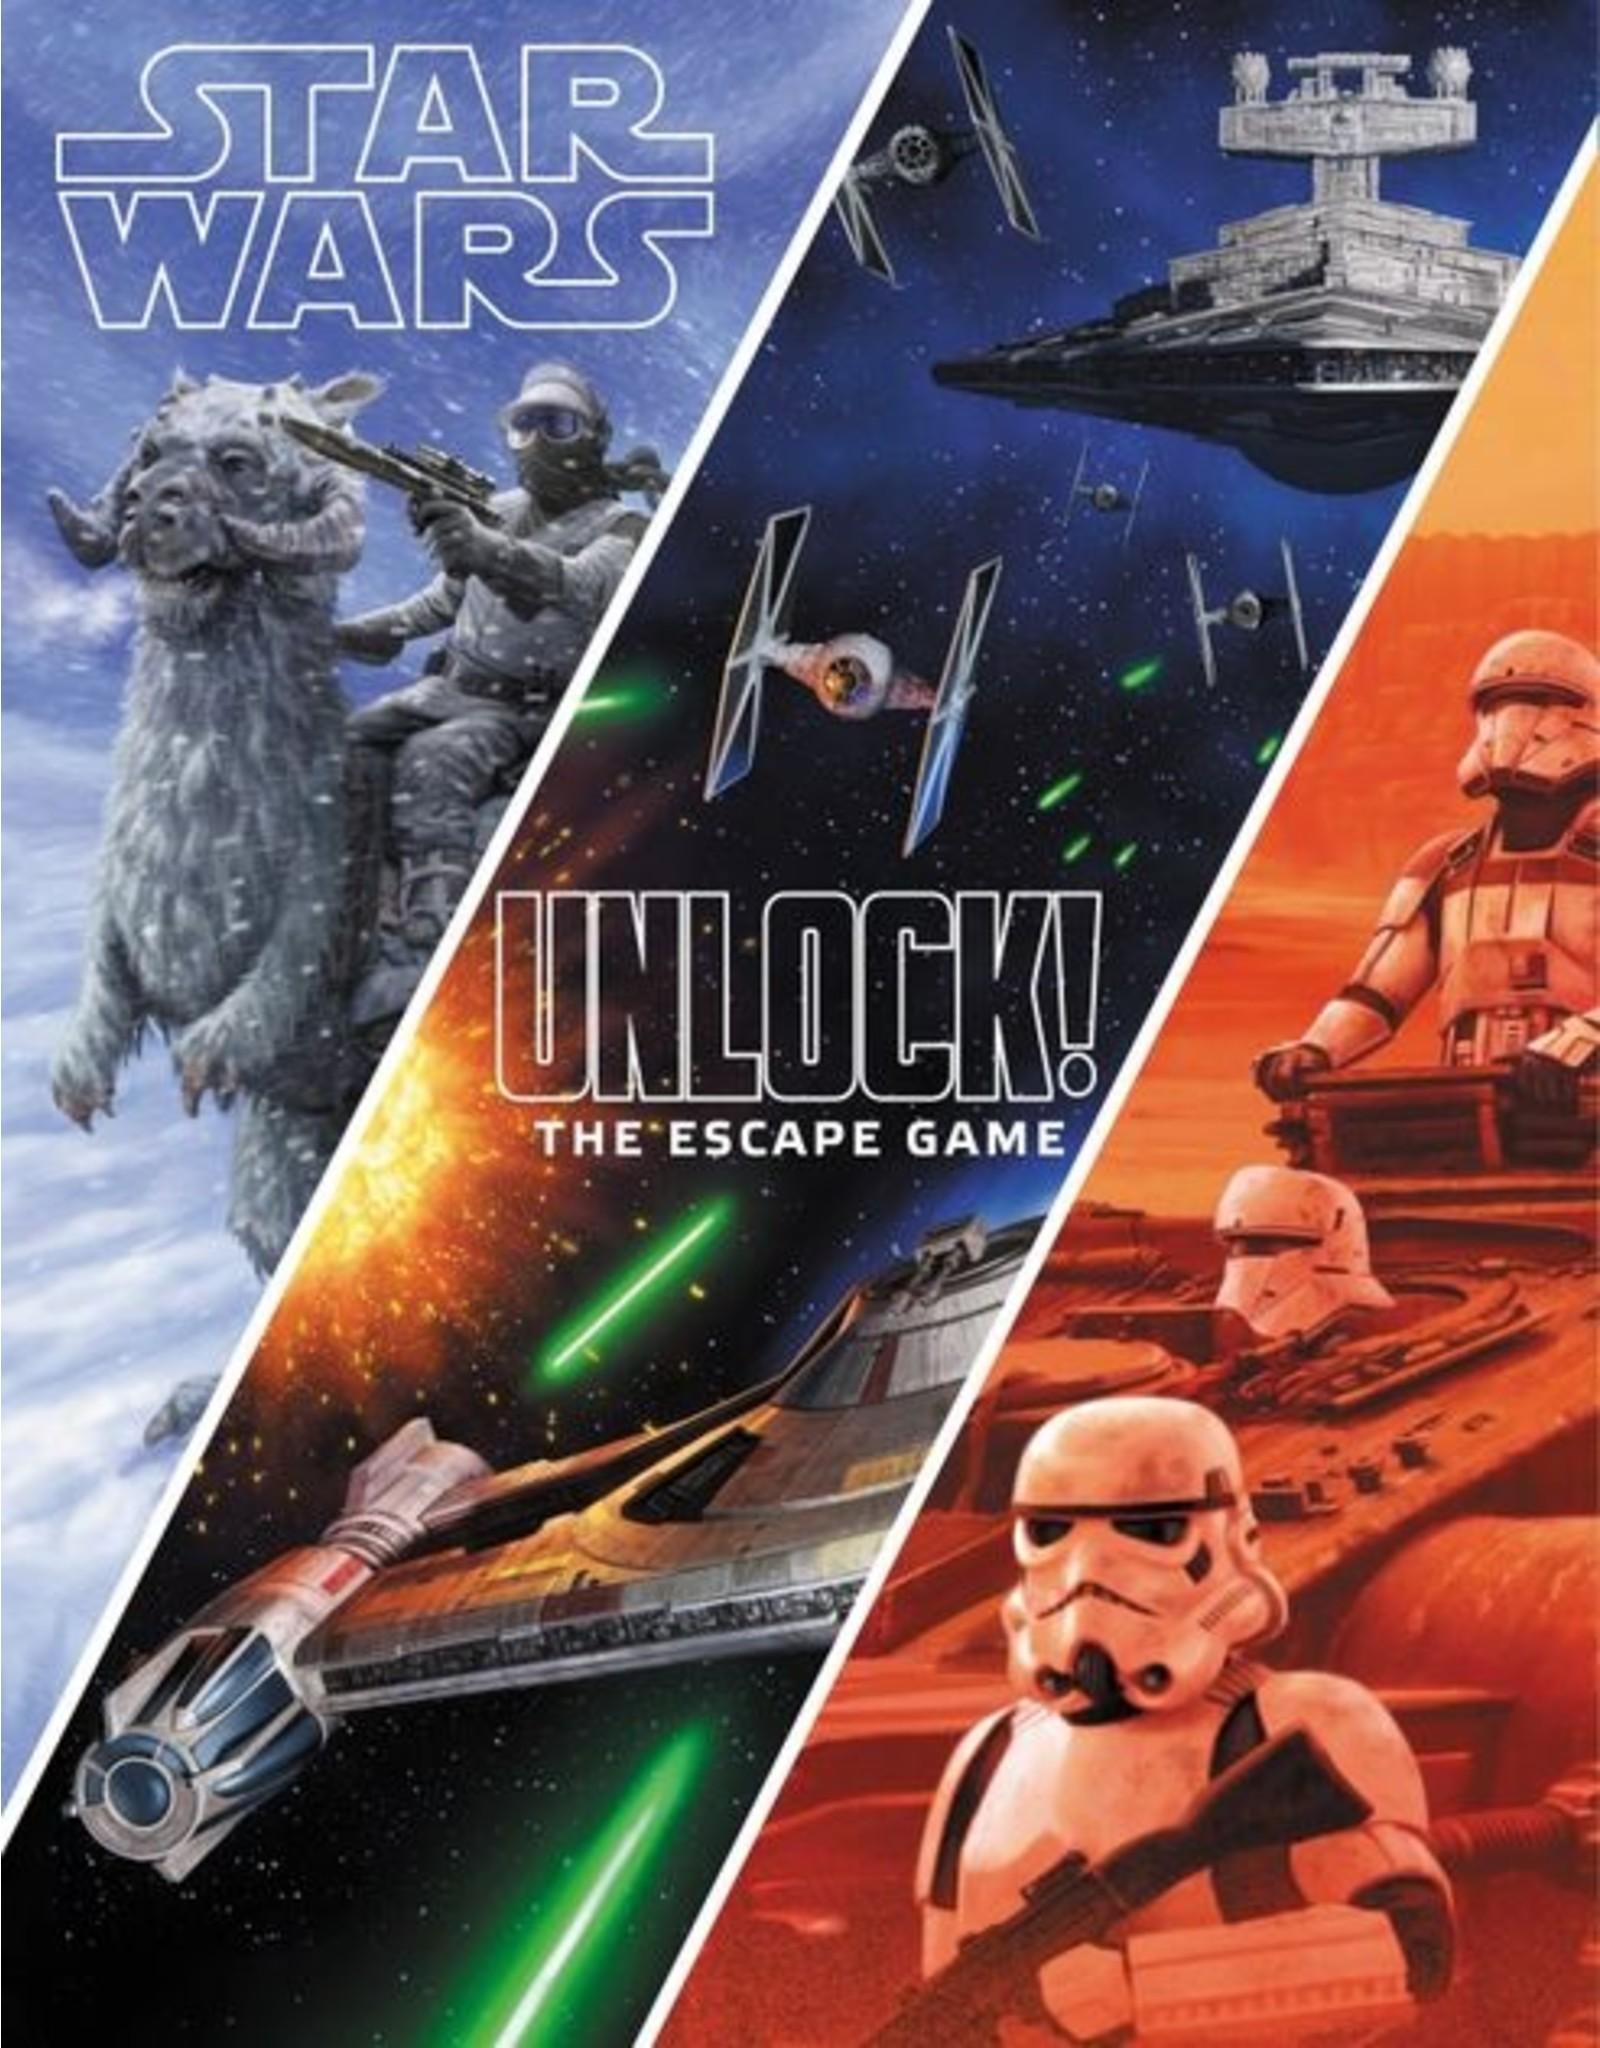 Star Wars UNLOCK!